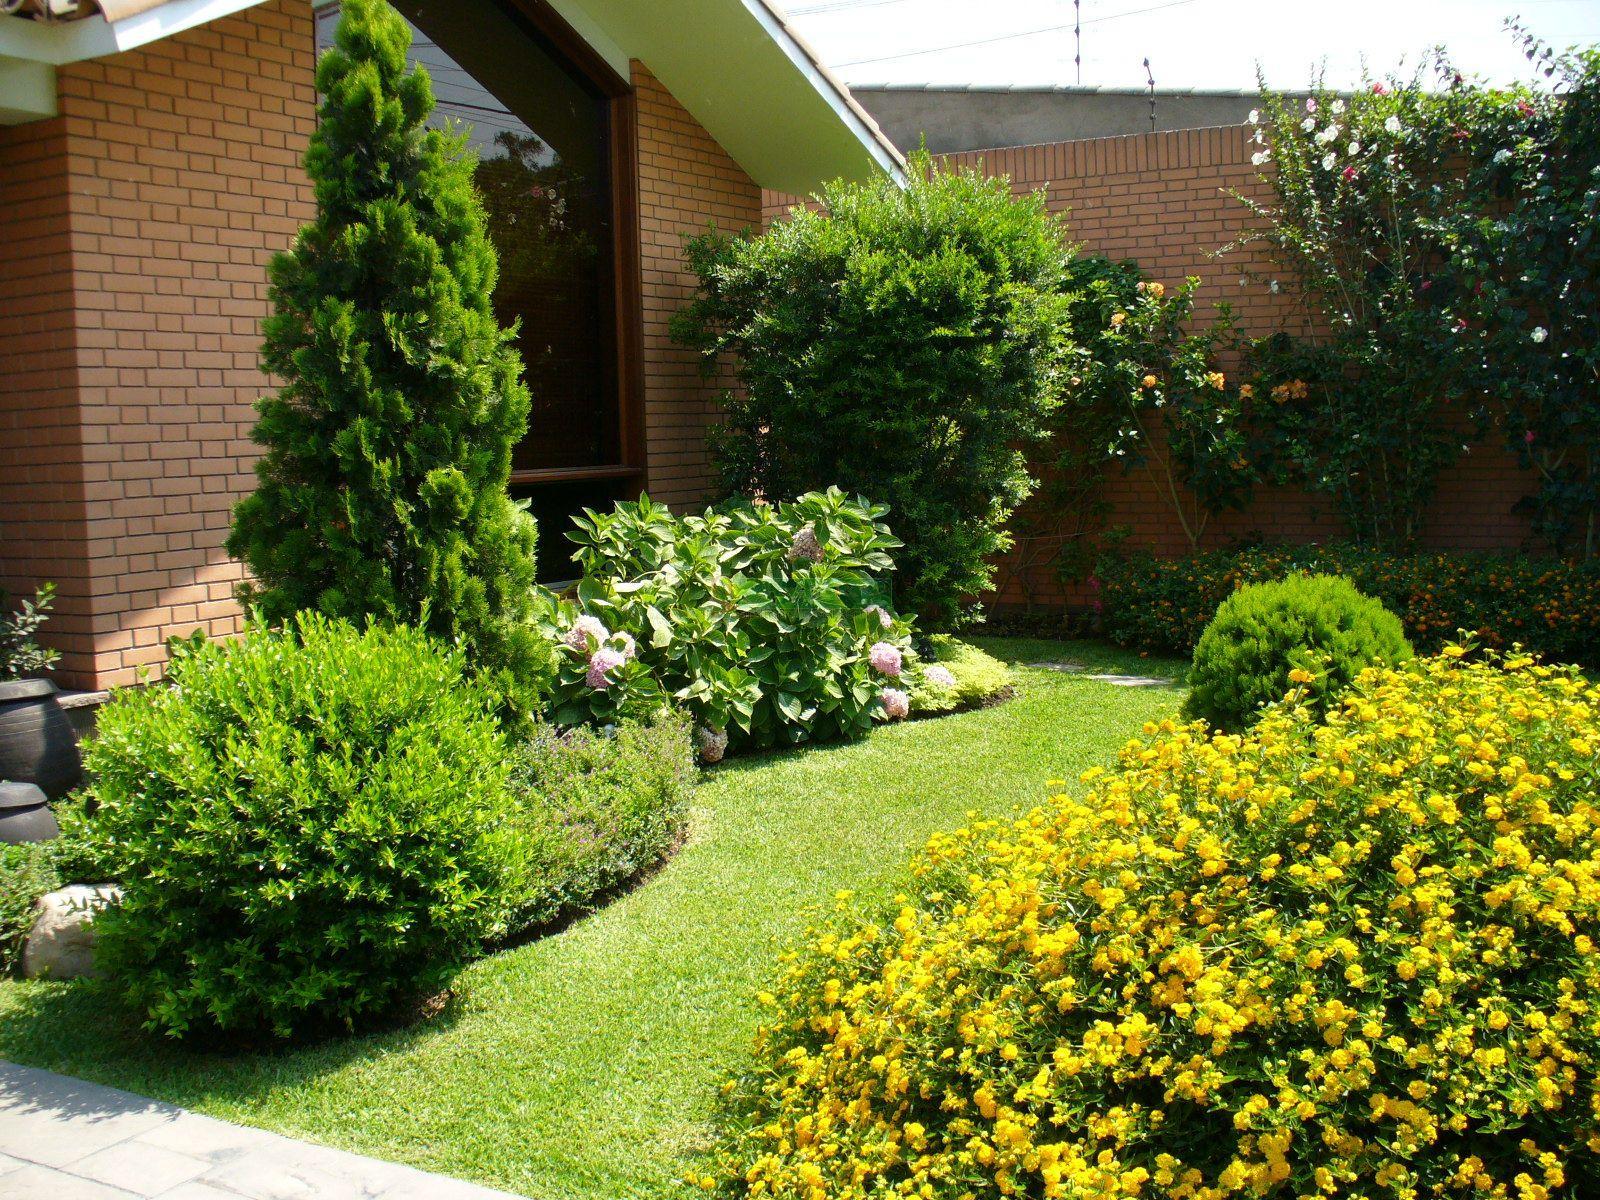 Dise o de jardines for Diseno de jardines lima